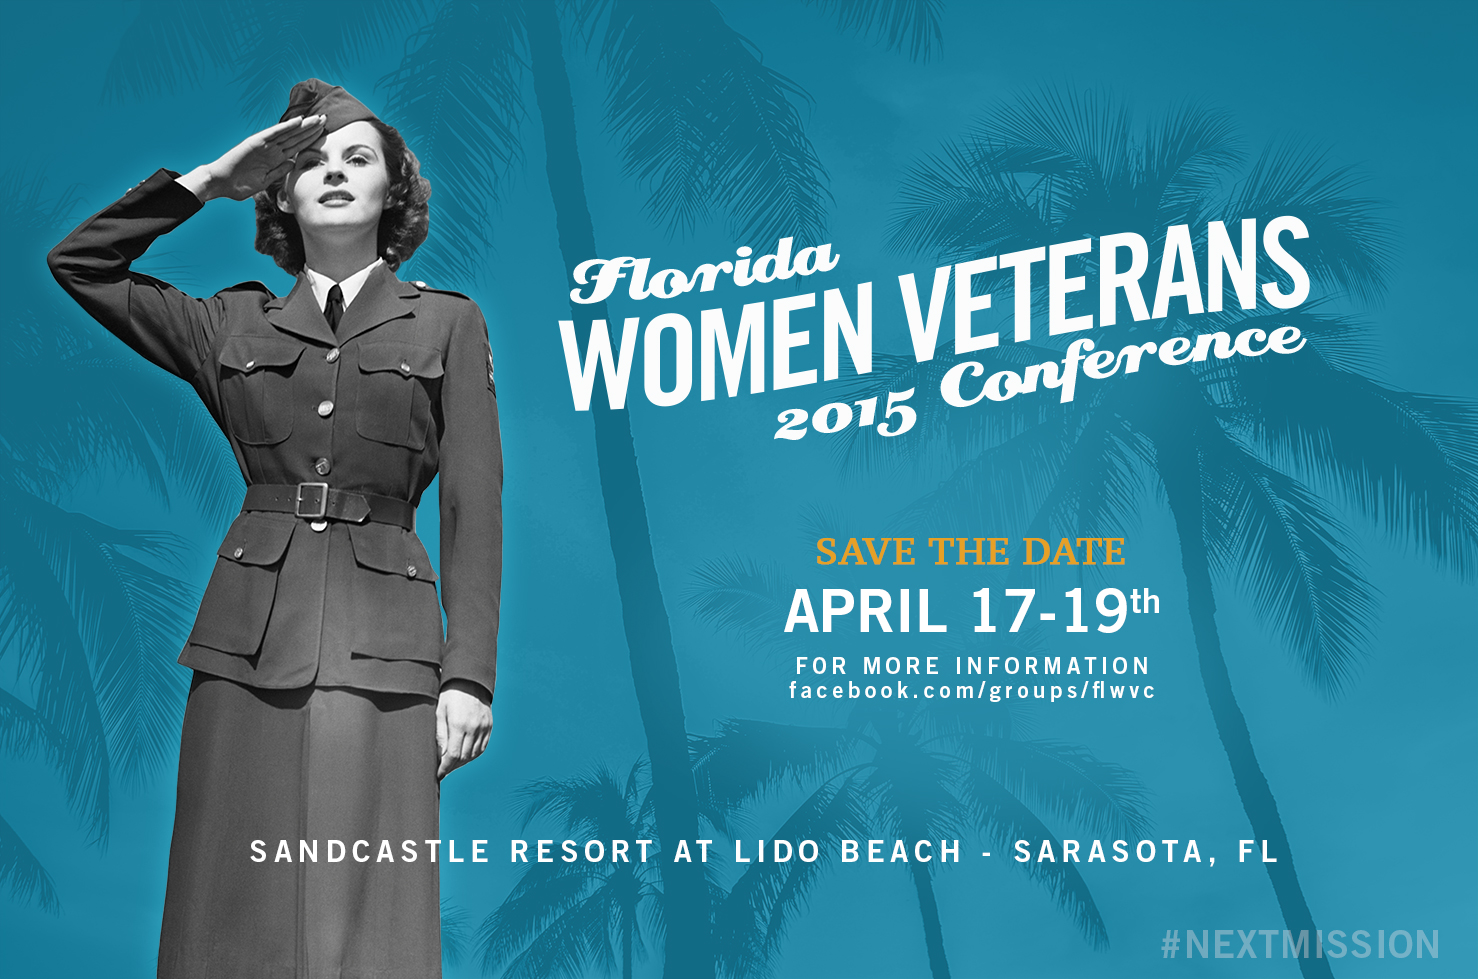 Women Veterans Conference 2015flyer WVC.jpg